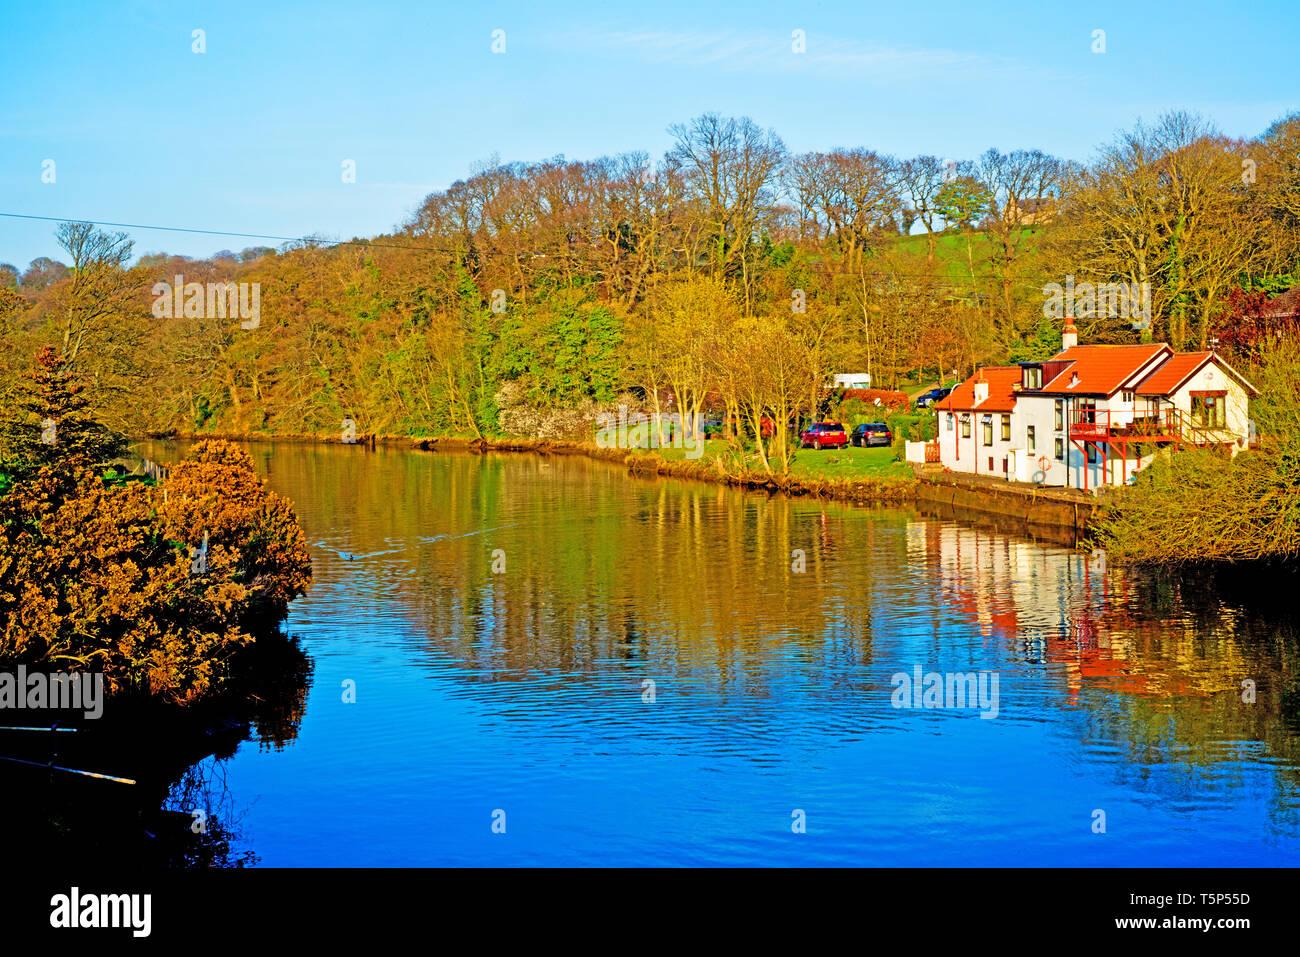 River Esk, Ruswarp, North Yorkshire, England - Stock Image